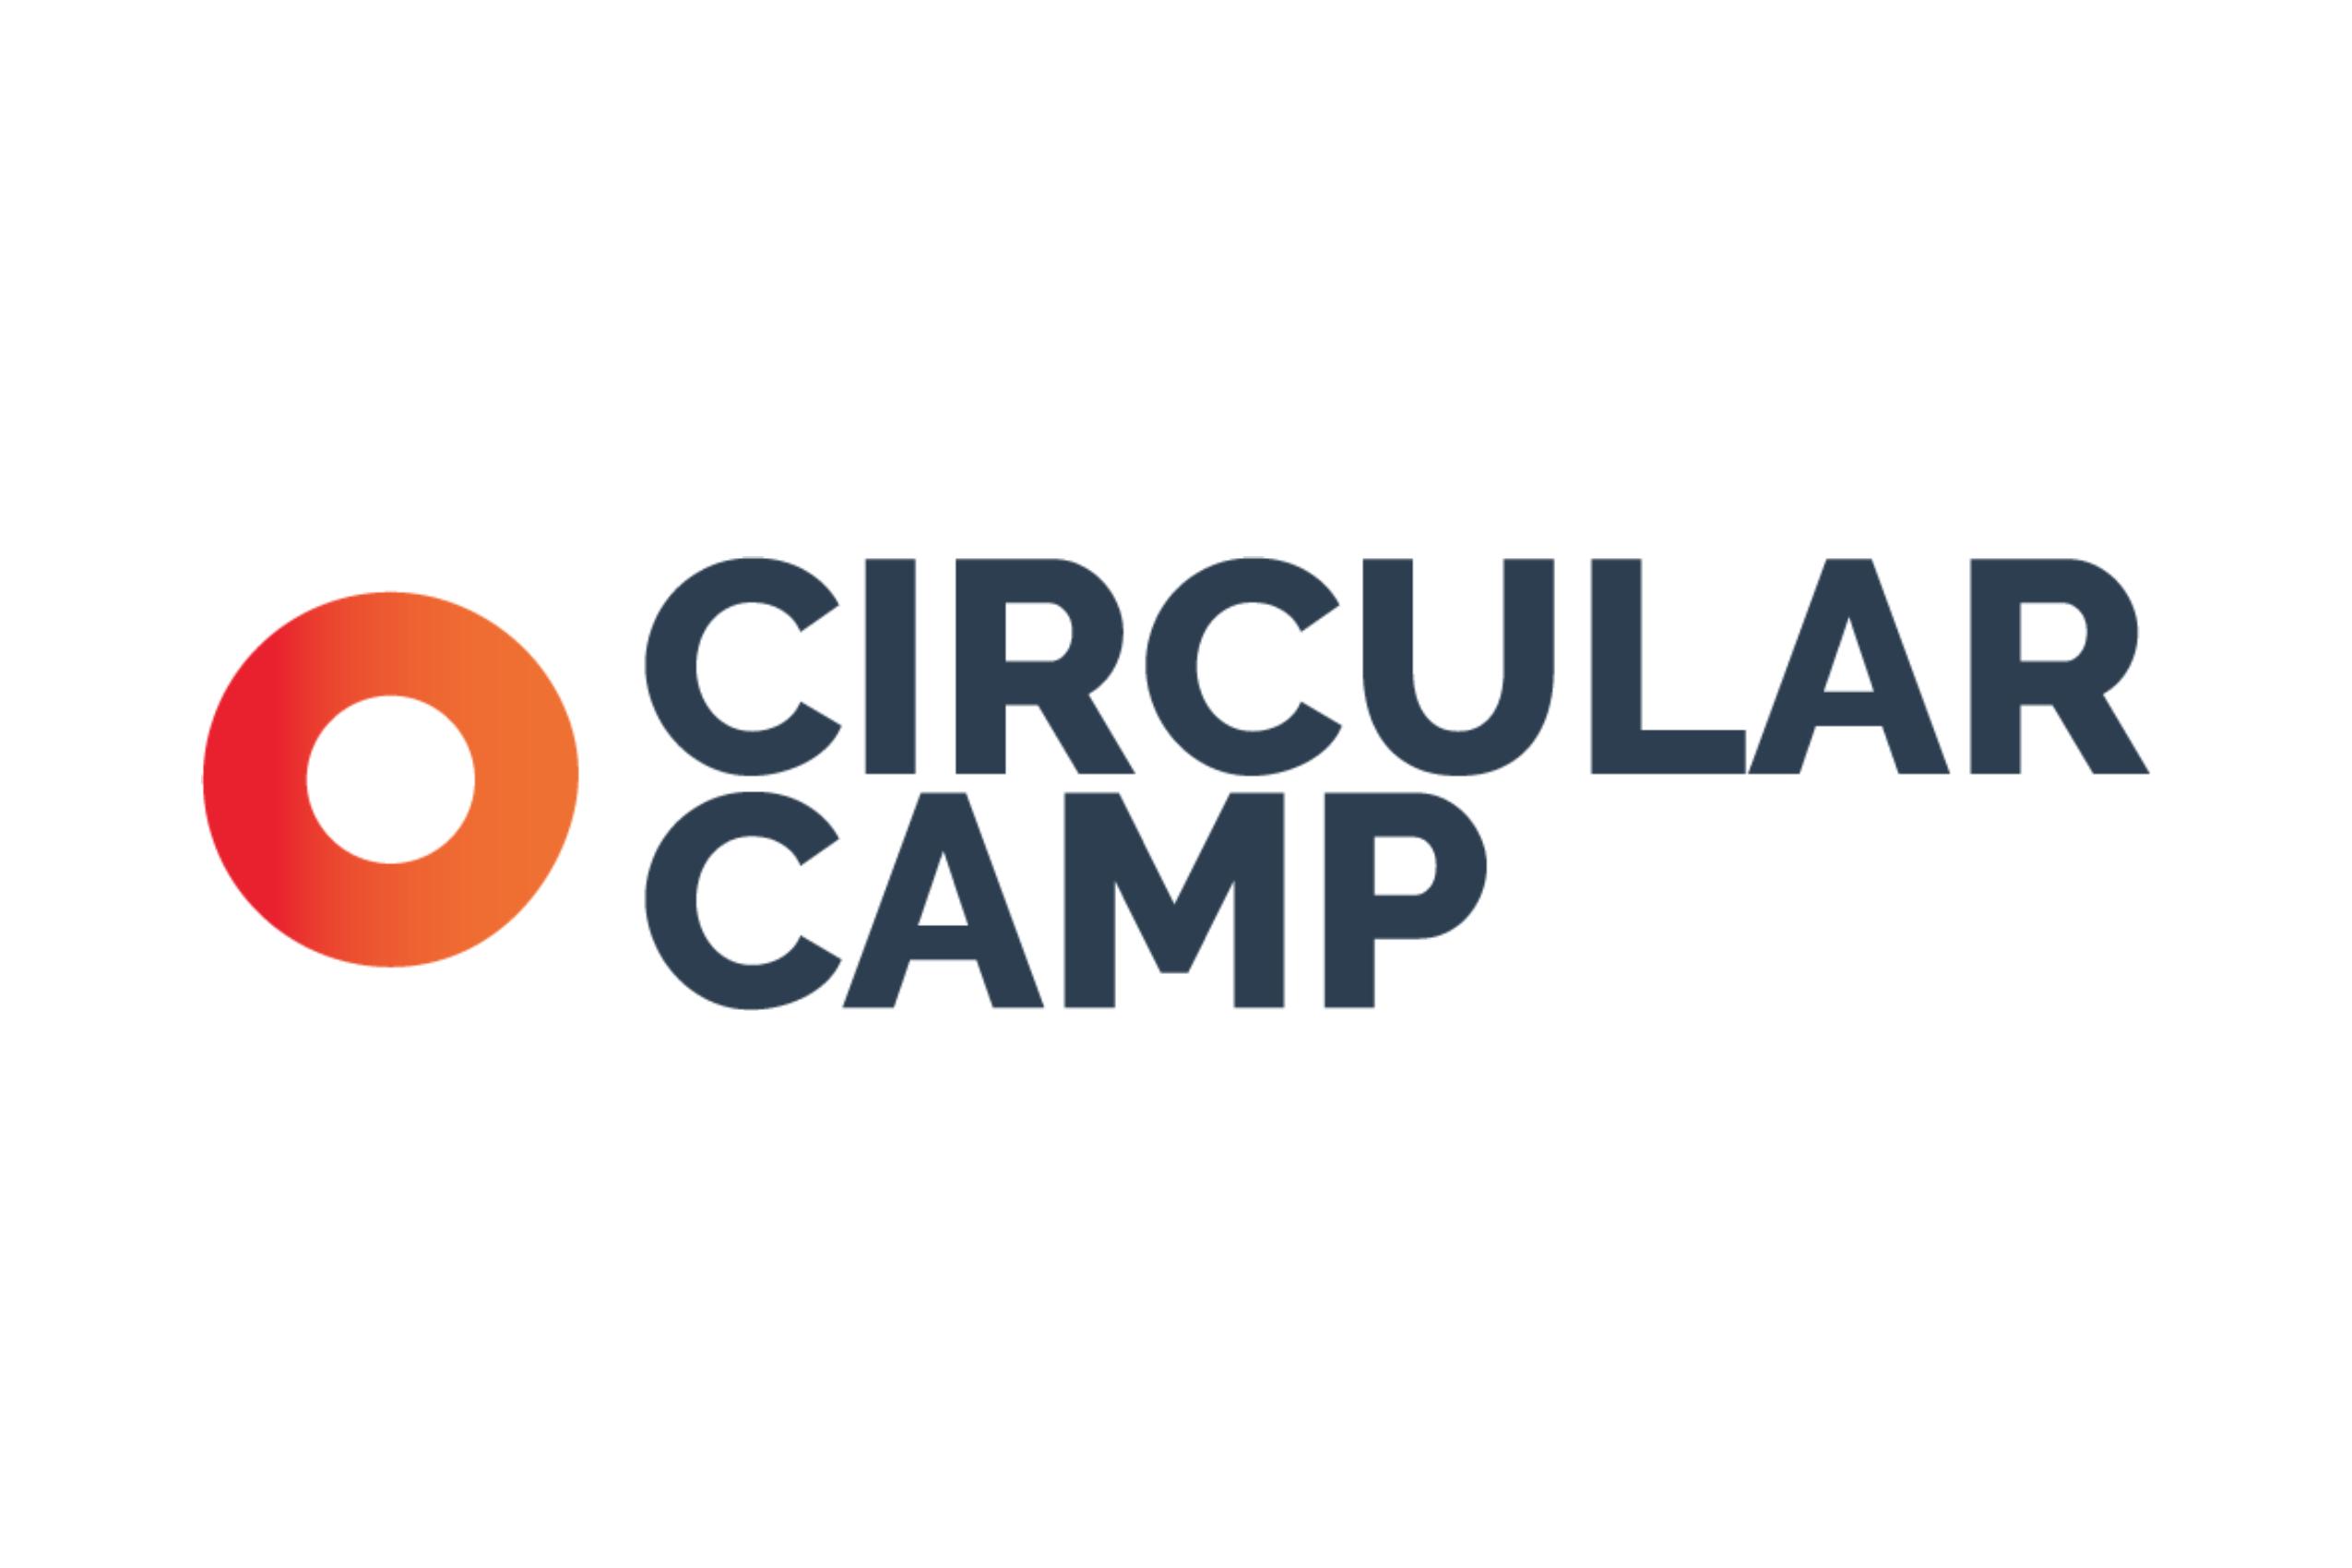 https://europeanplasticspact.org/wp-content/uploads/2021/05/circular-camp.png